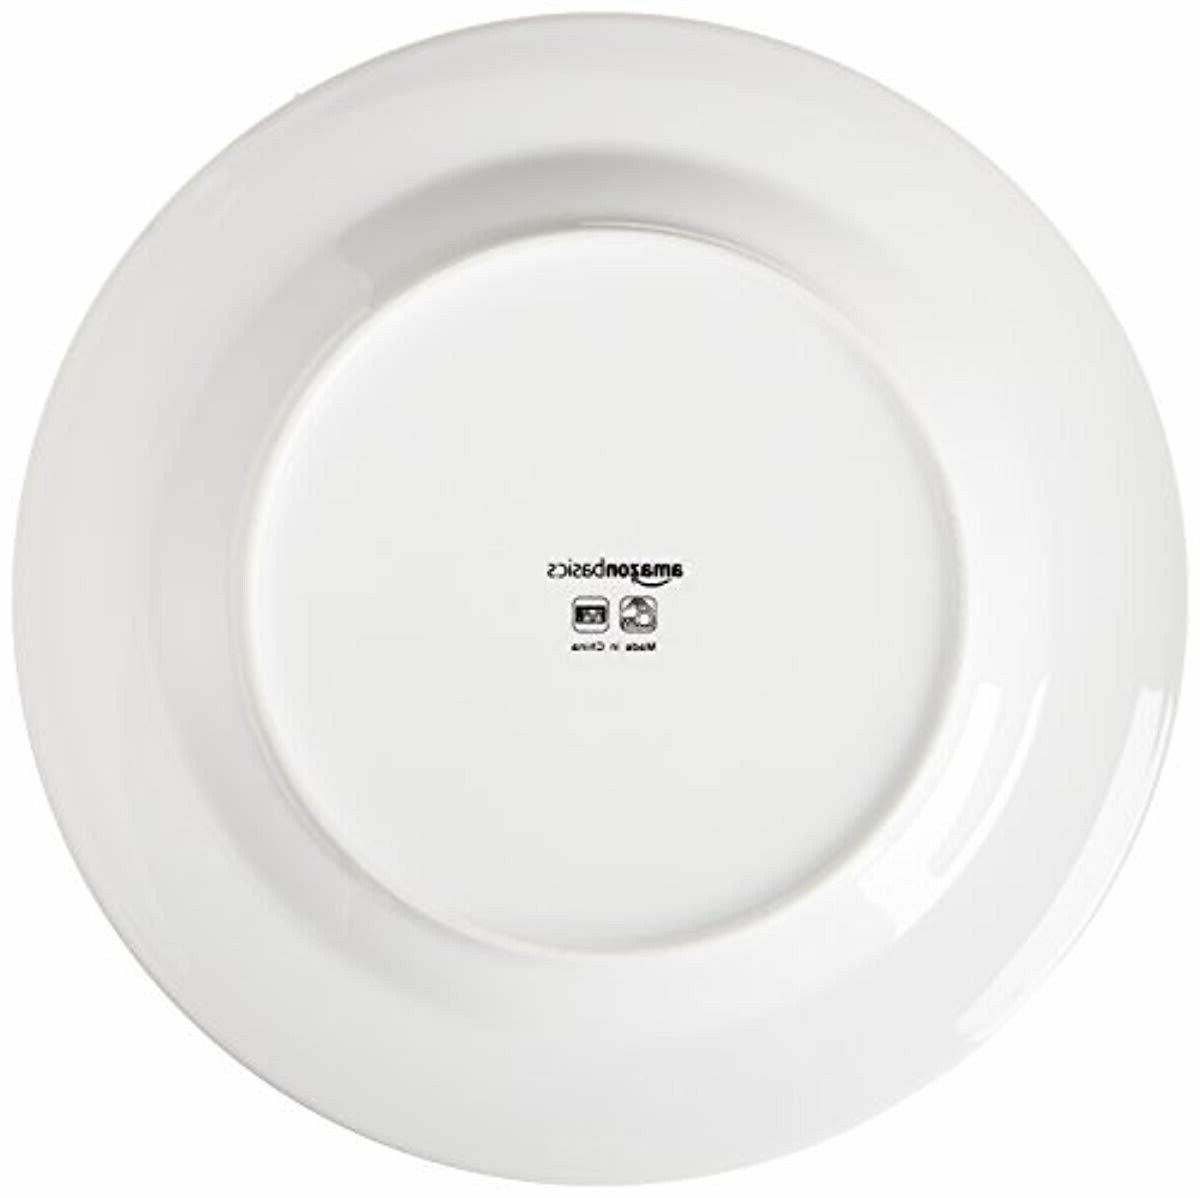 AmazonBasics 16-Piece Dinnerware Set, Service